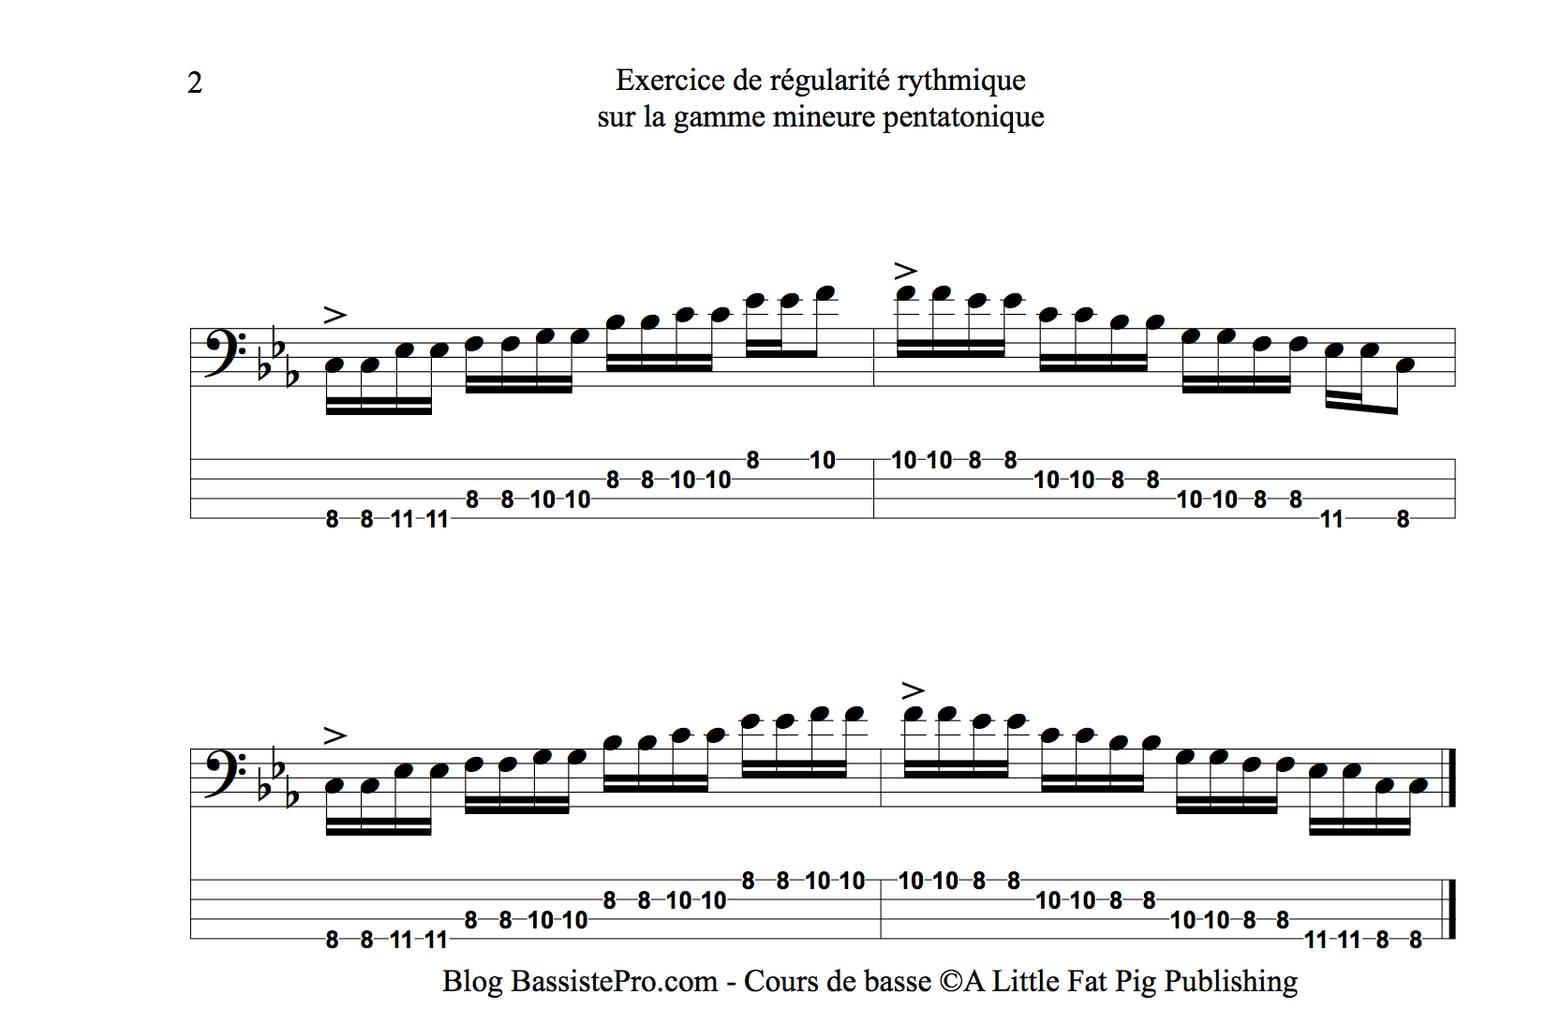 gamme mineure pentatonique a la guitare basse exercice regularite rythmique 2